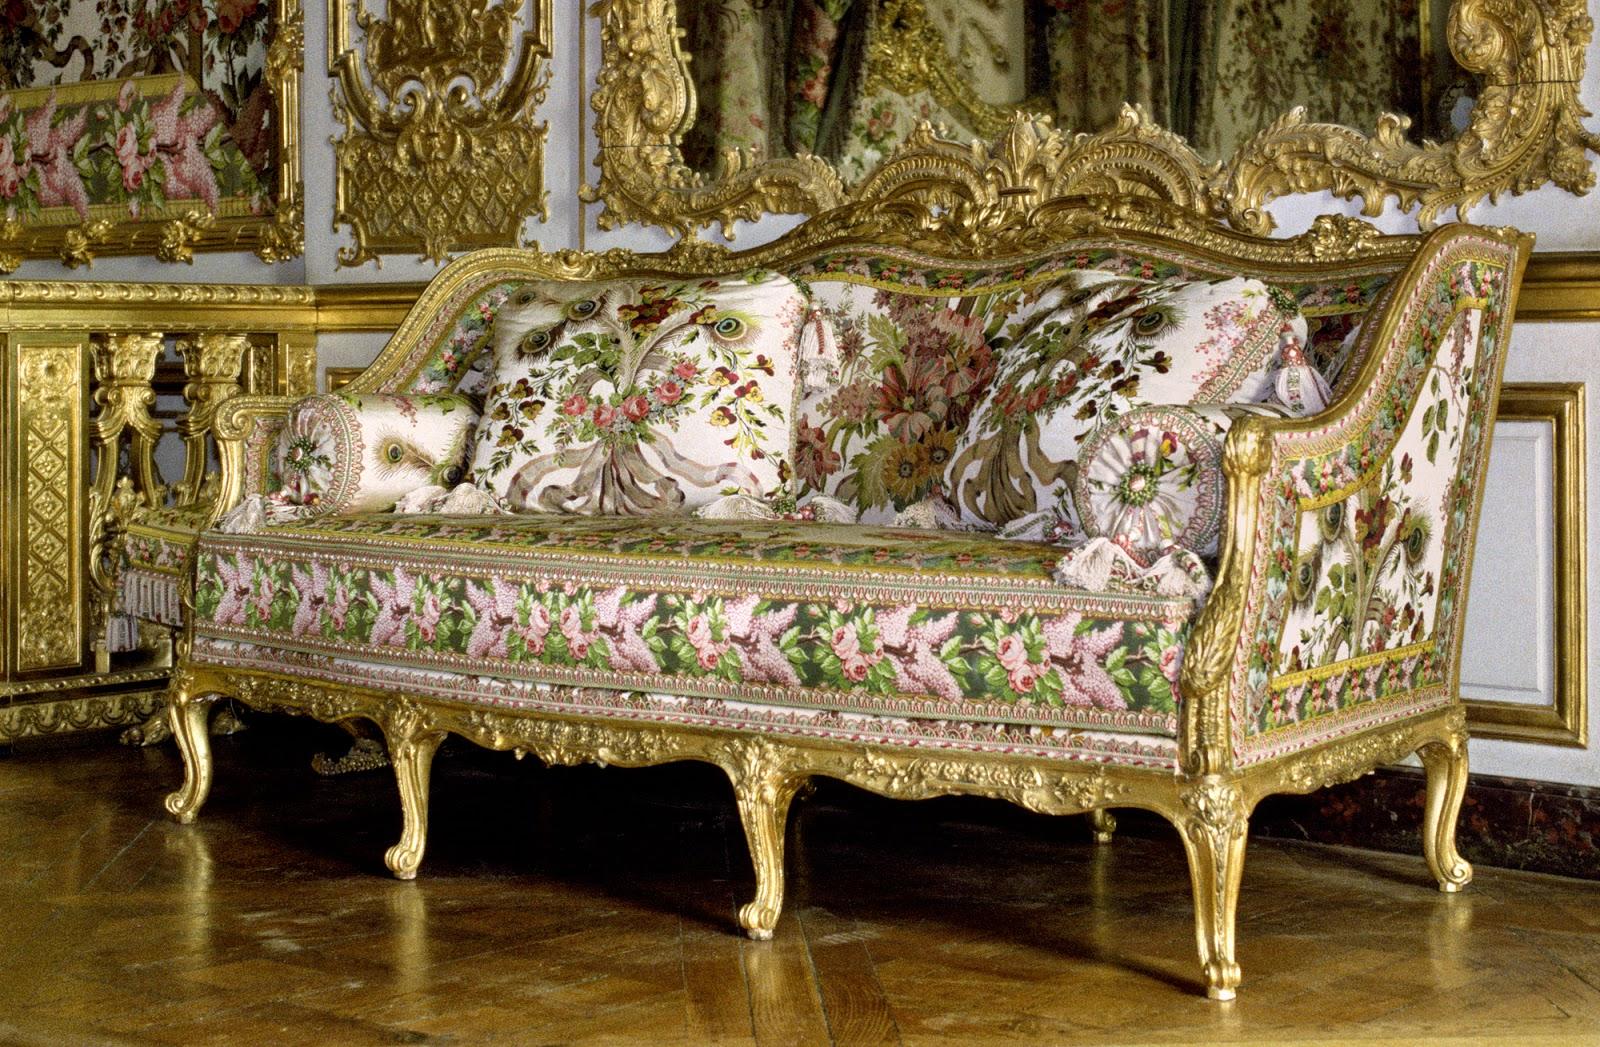 art et techniques de la dorure versailles canap foliot chambre de la reine. Black Bedroom Furniture Sets. Home Design Ideas